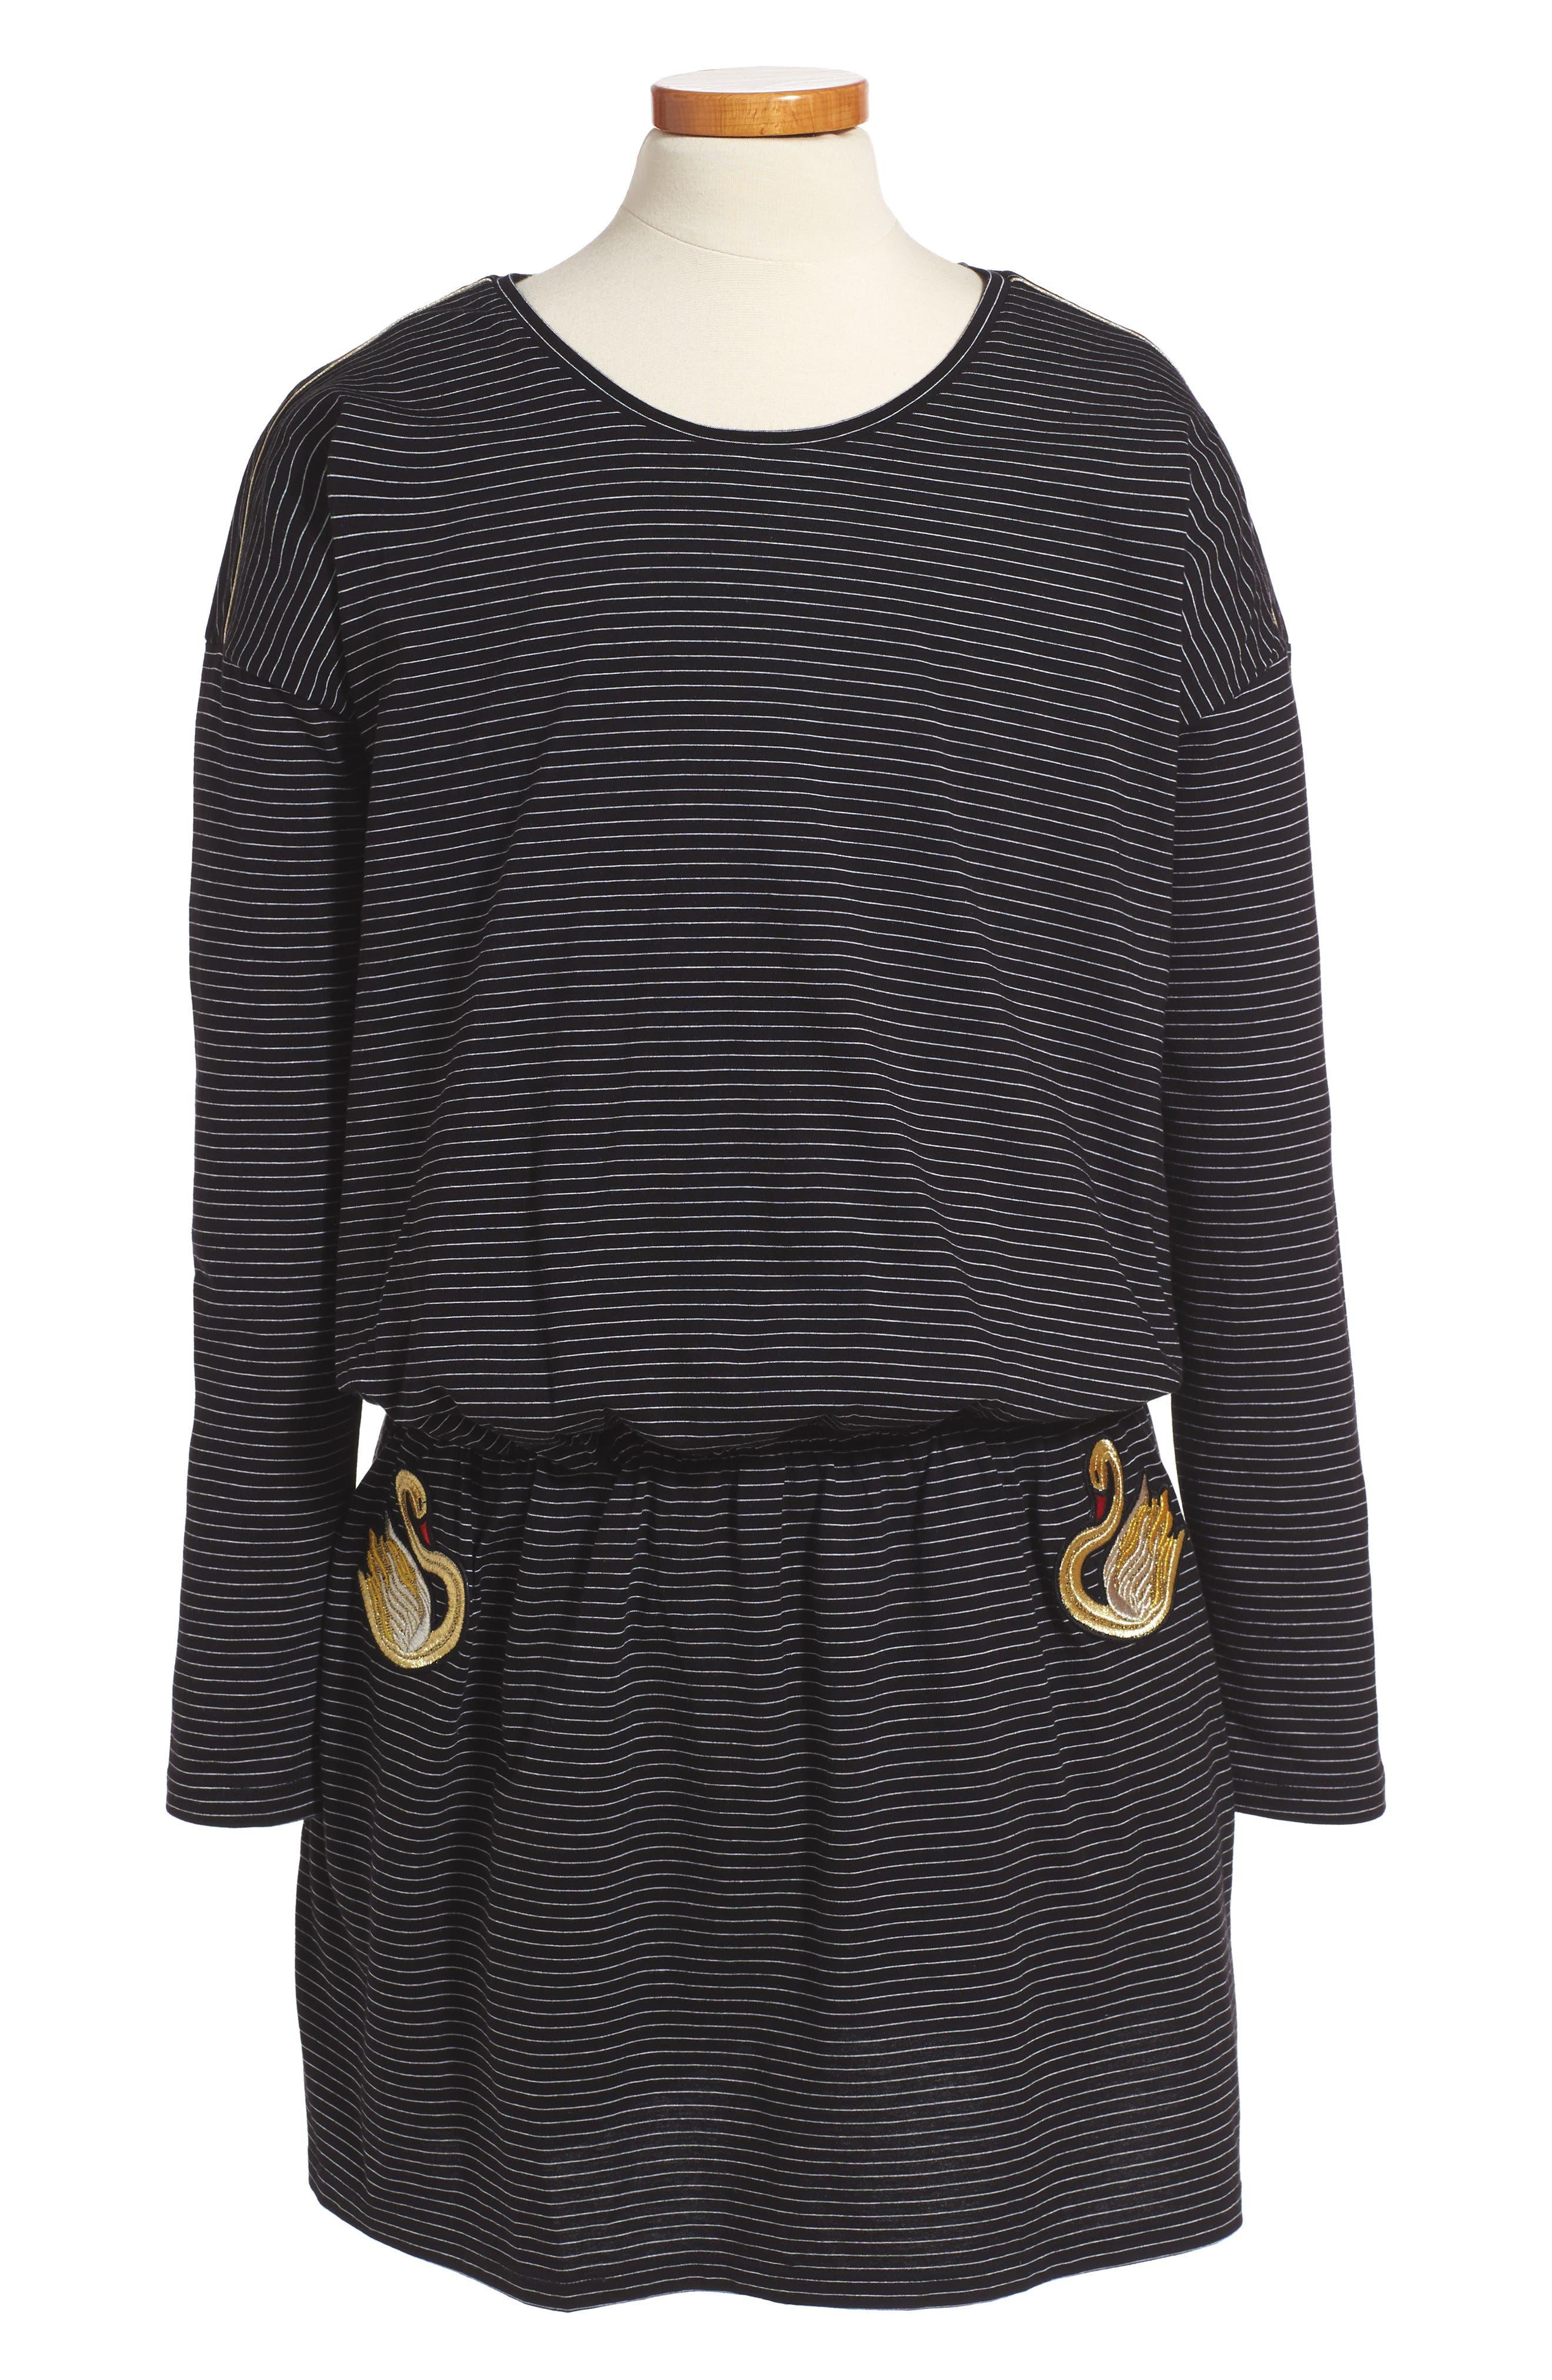 Swan Embroidered Blouson Dress,                             Main thumbnail 1, color,                             001